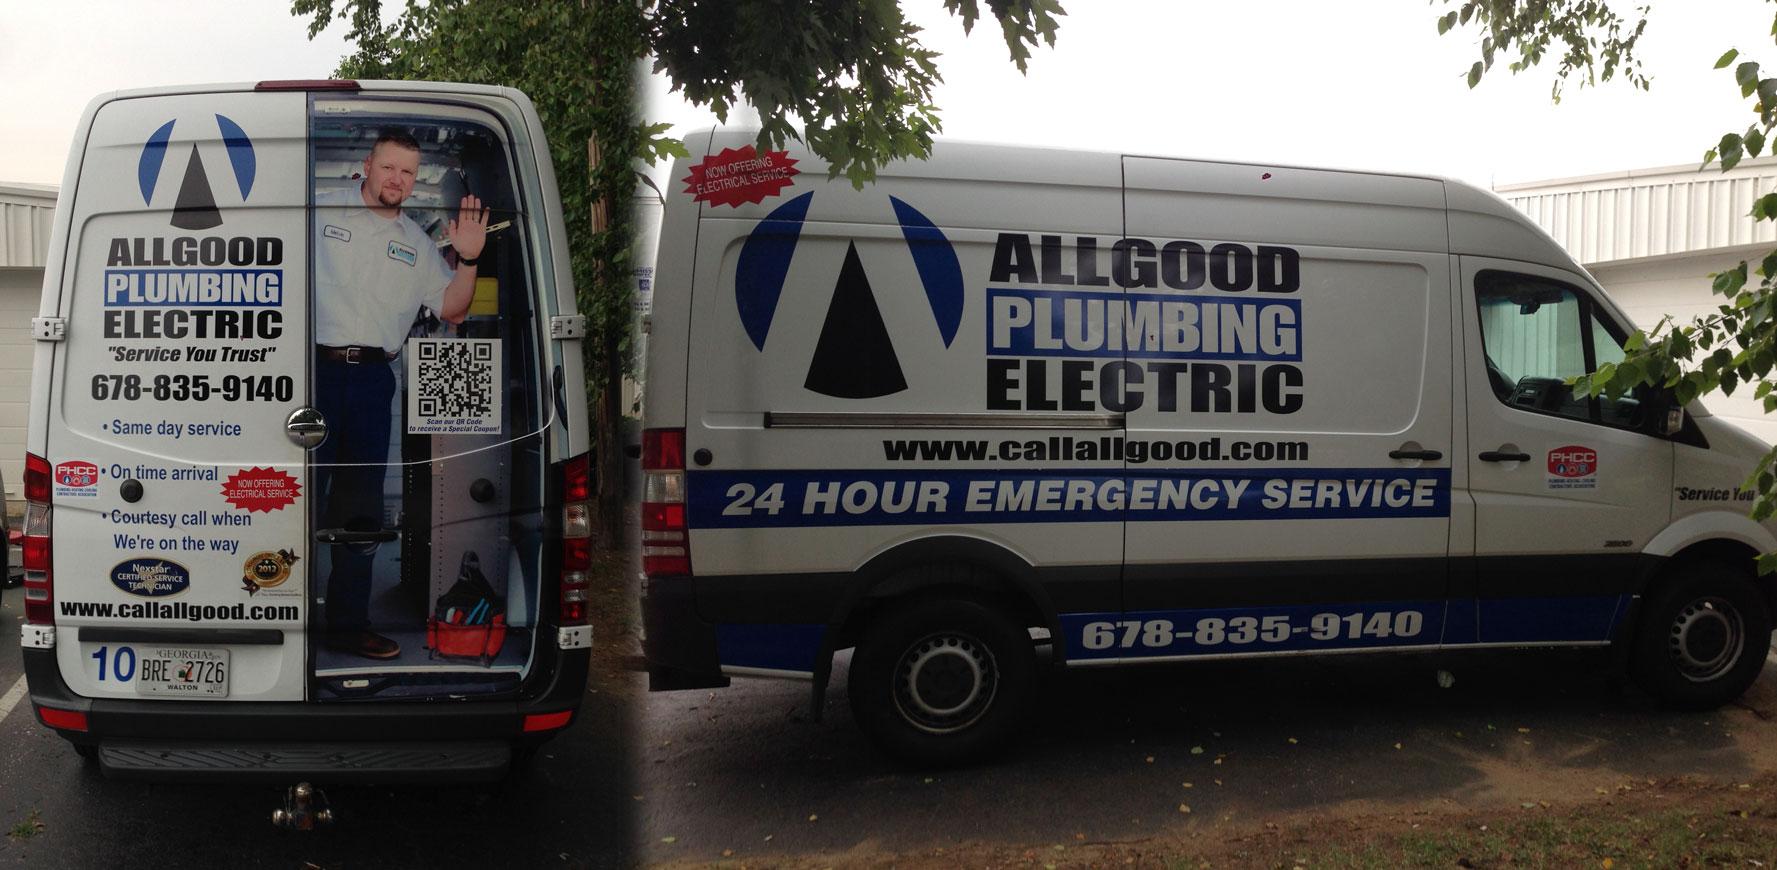 Allgood Plumbing Image